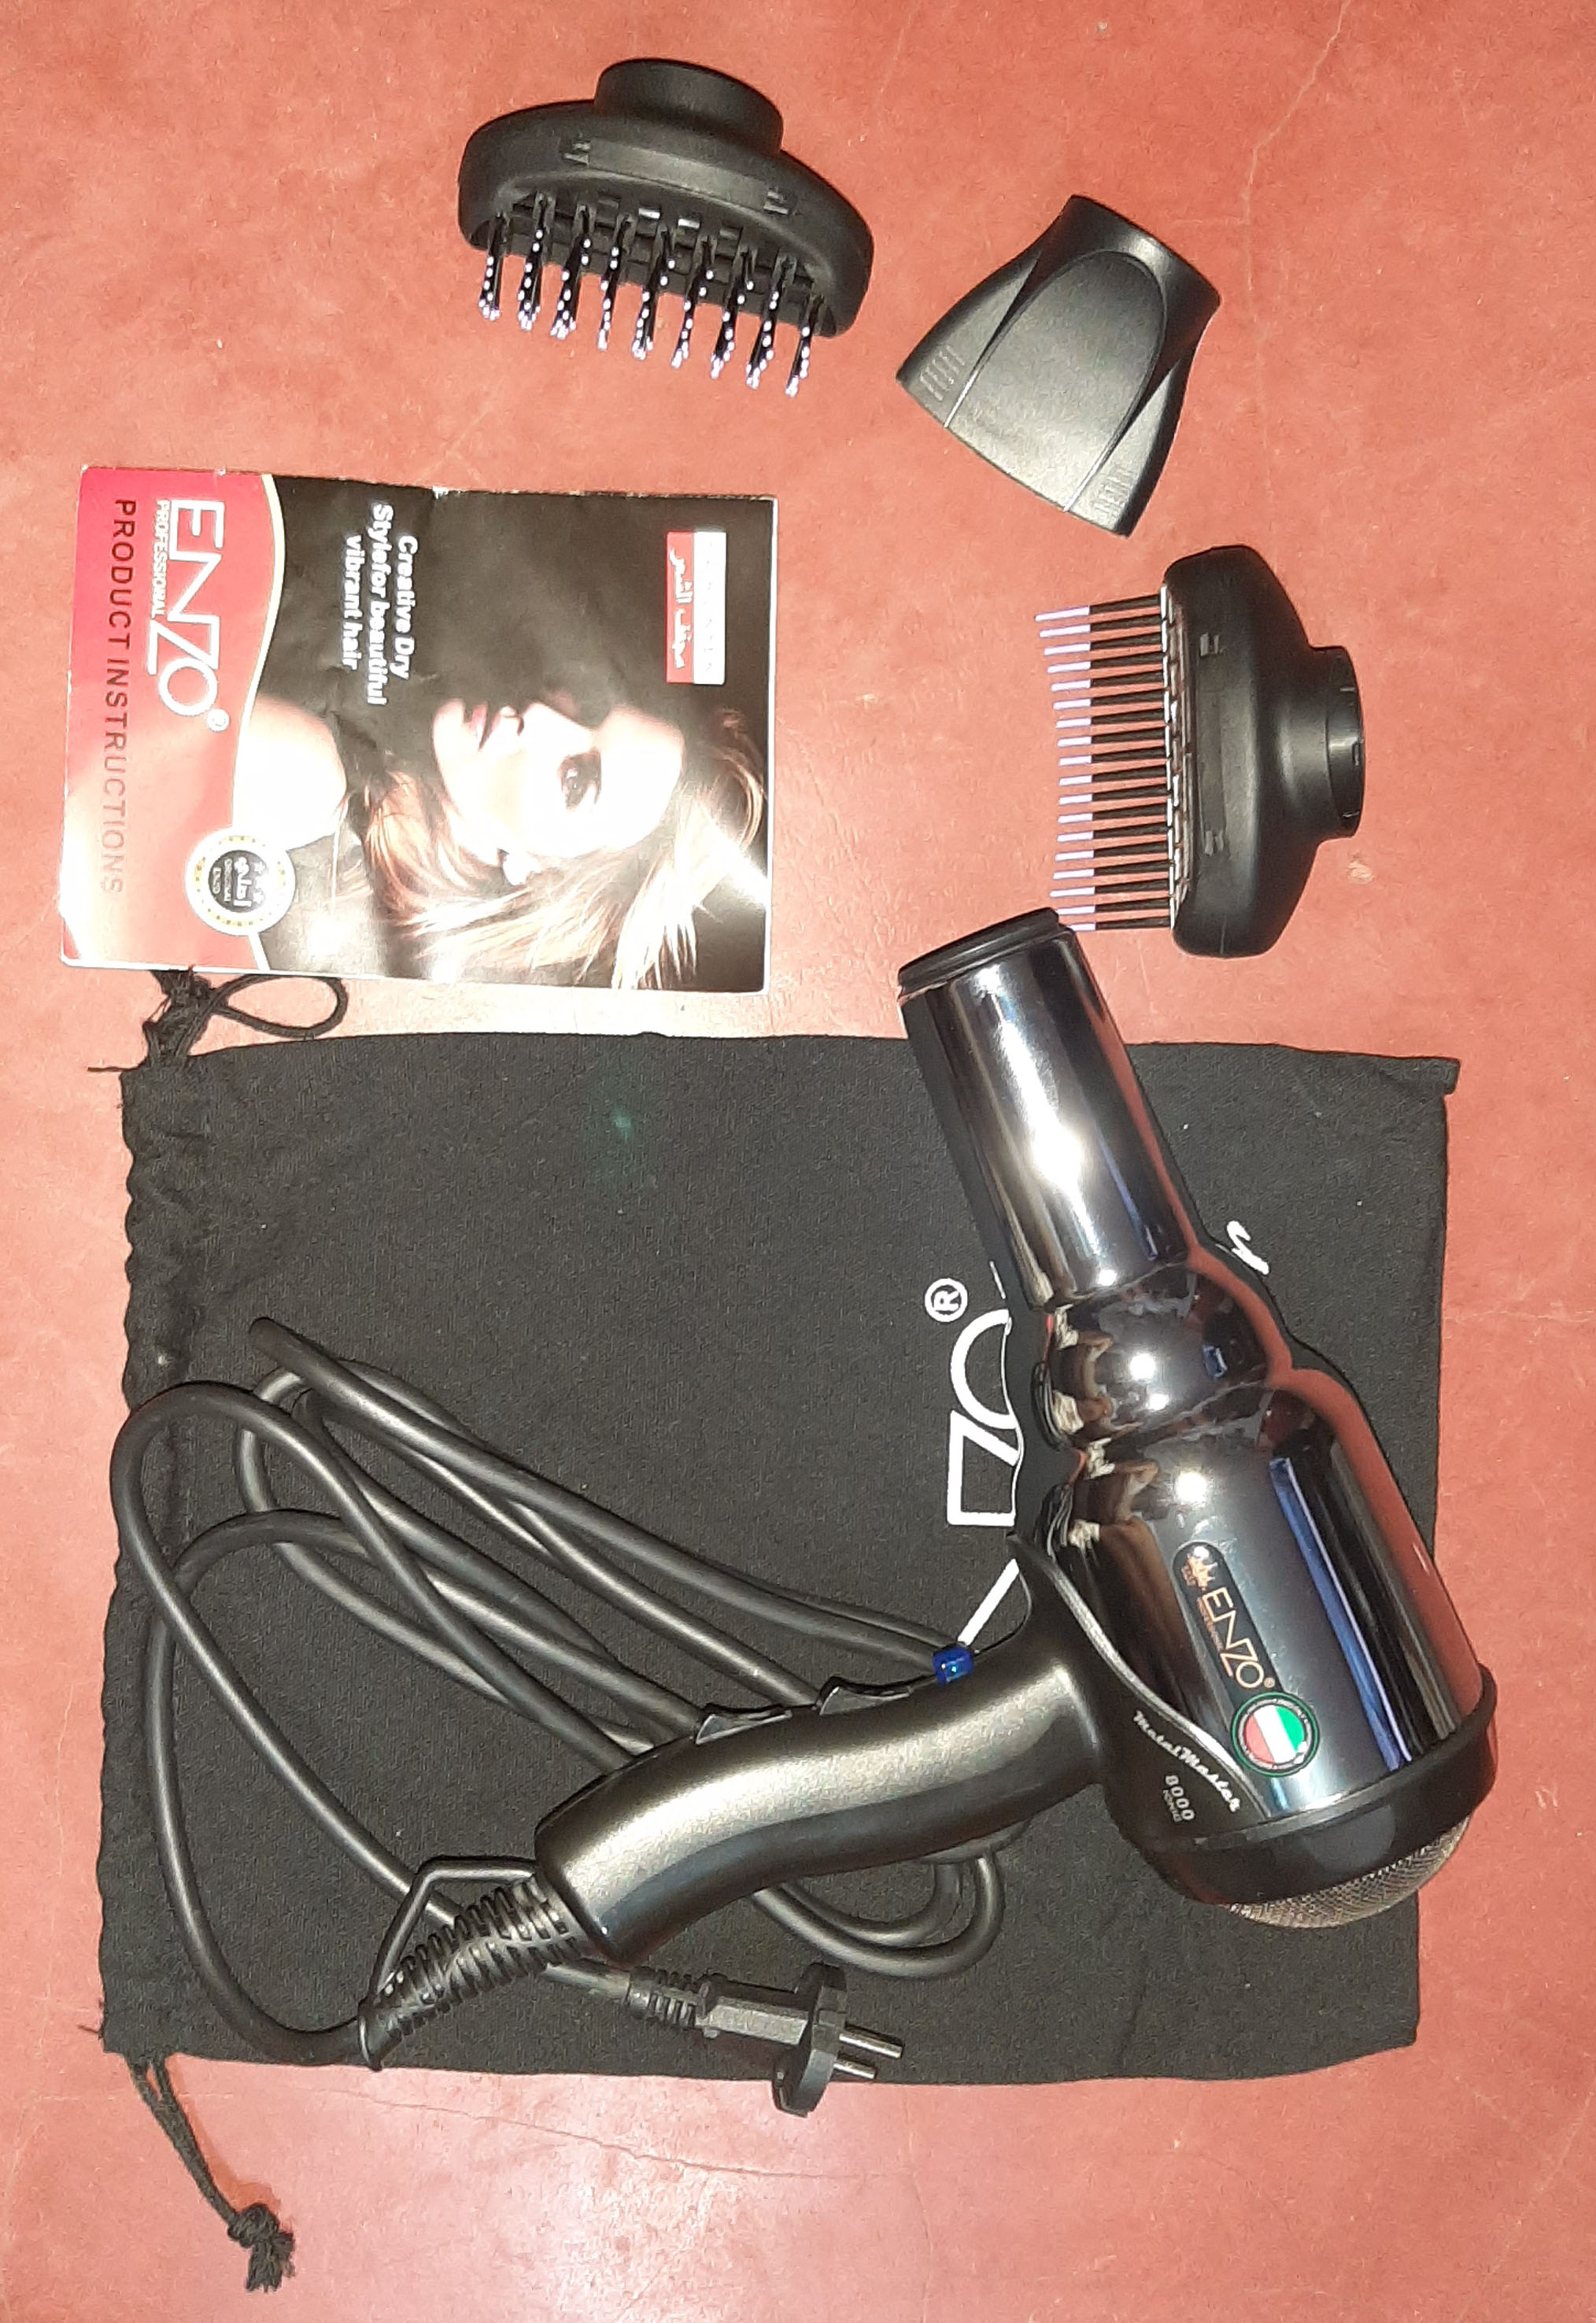 Secadores de cabelo Volumizer Professional Secador